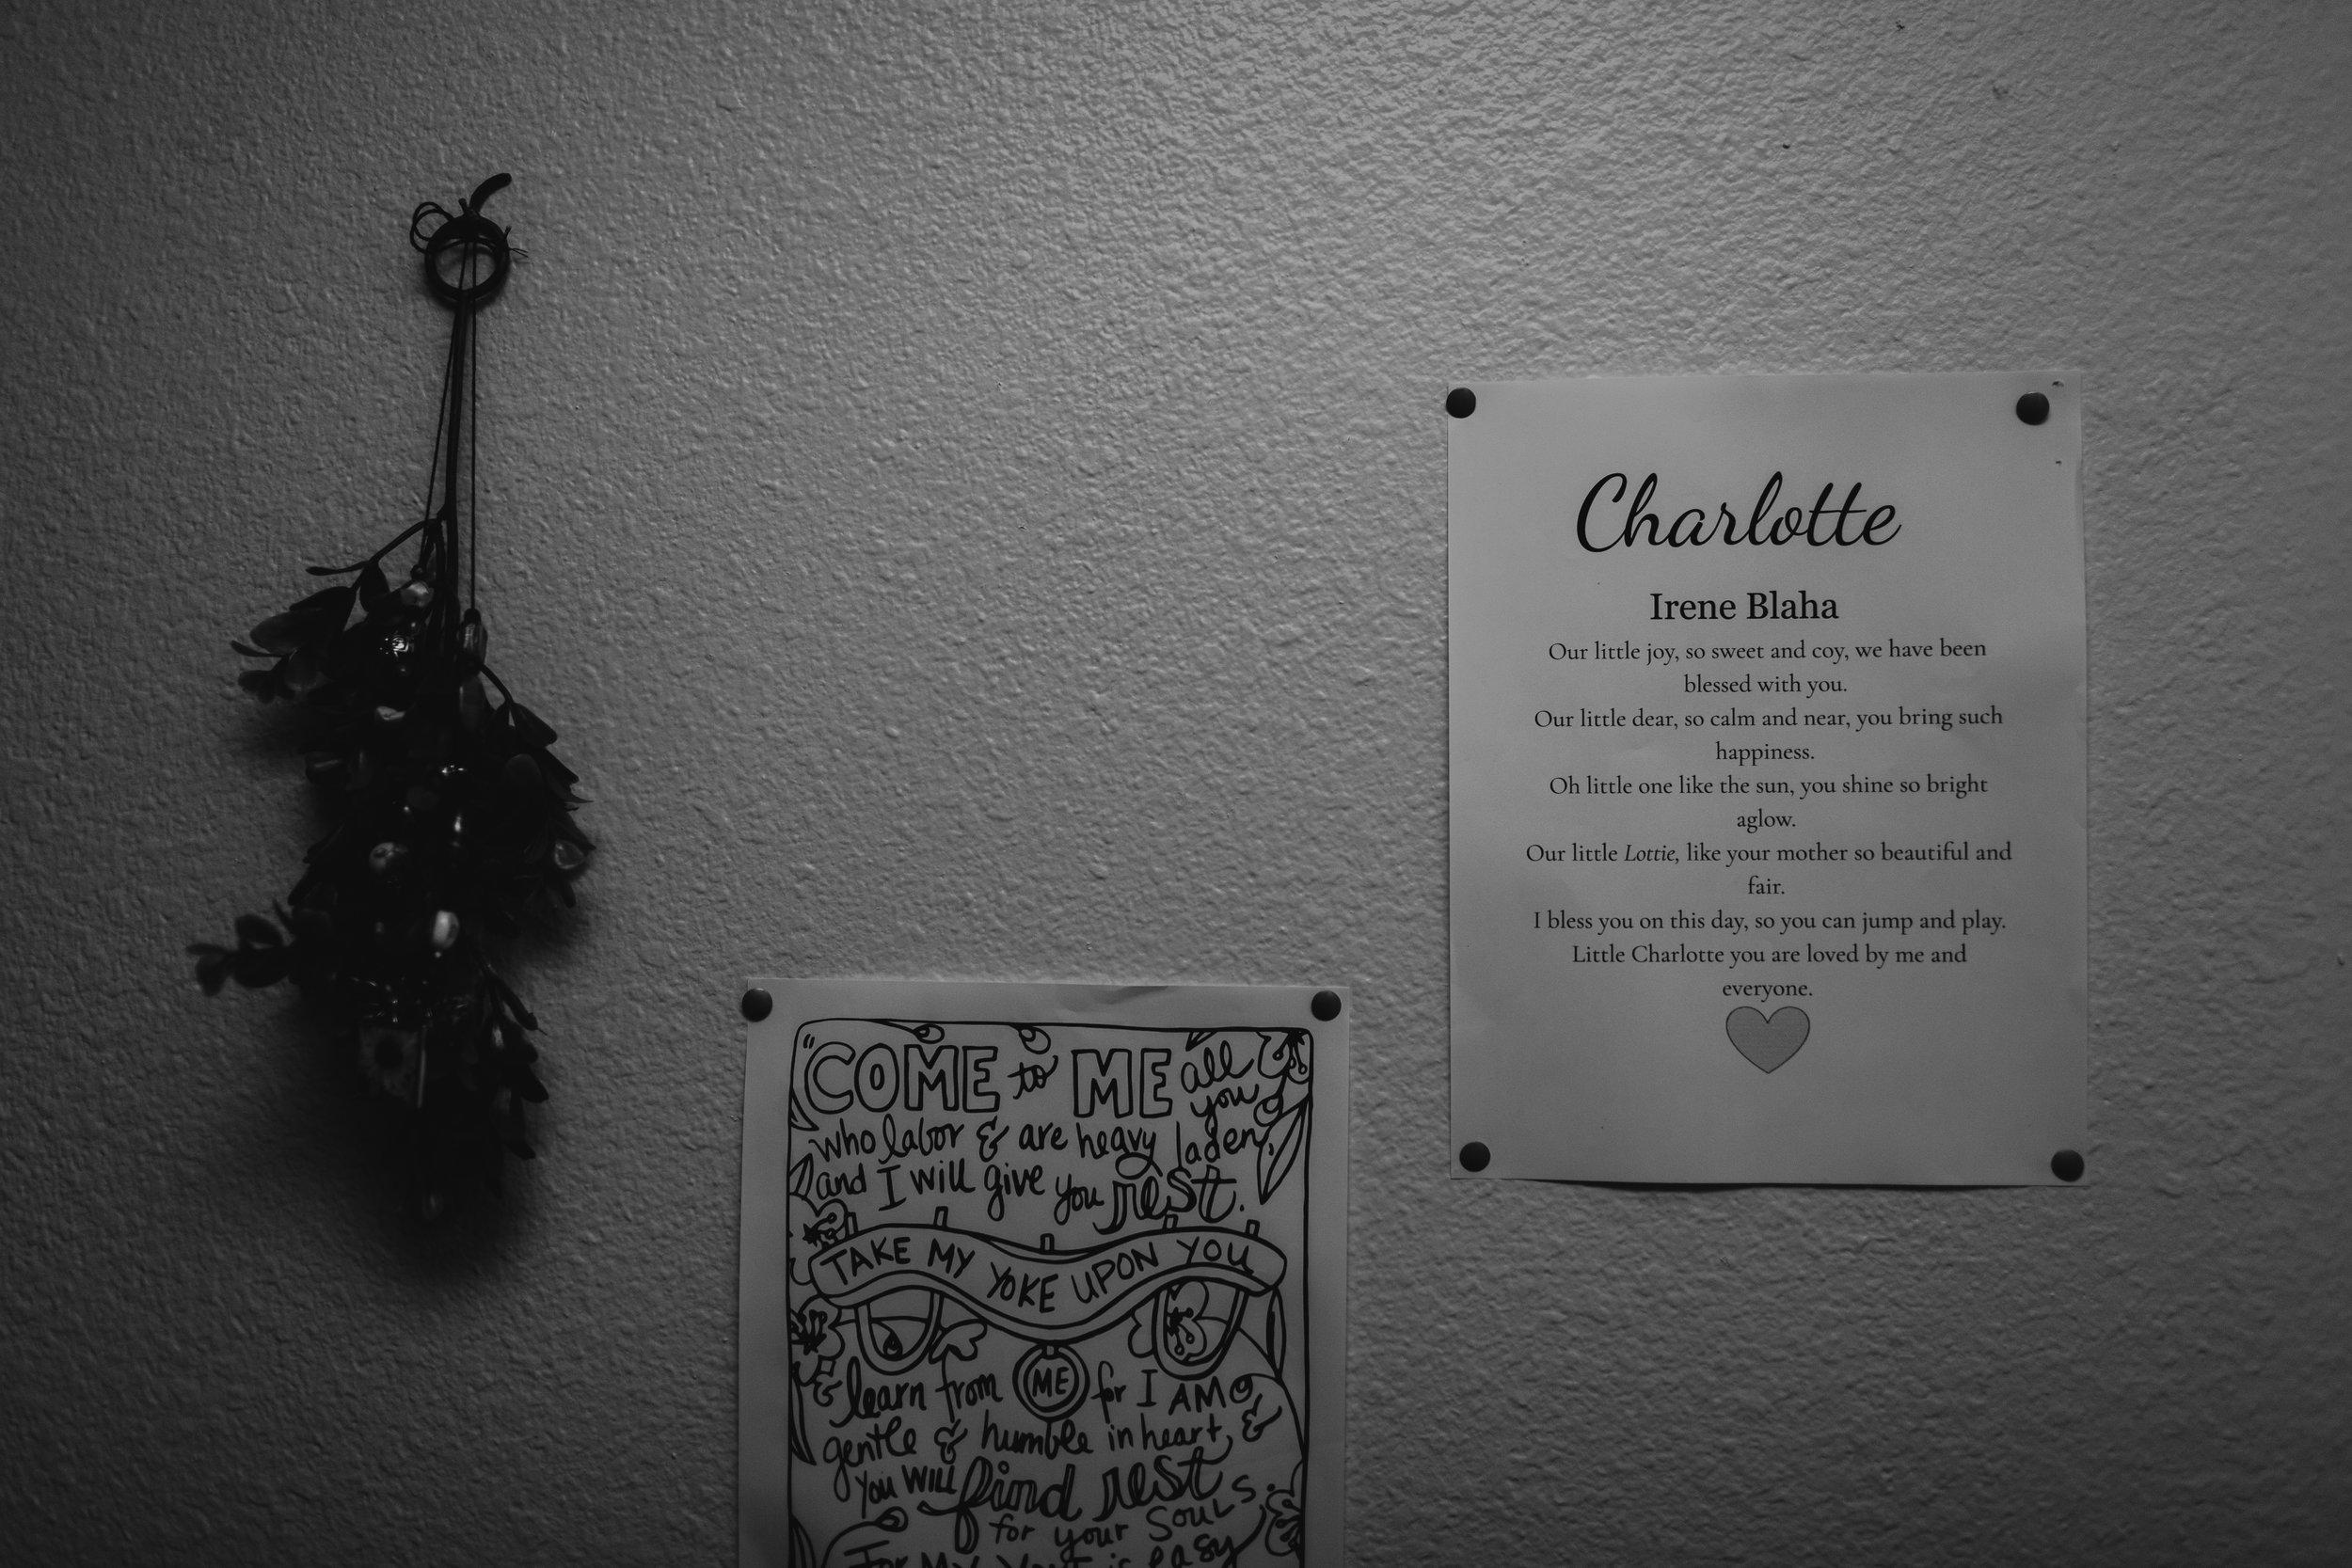 Charlotte-6.JPG